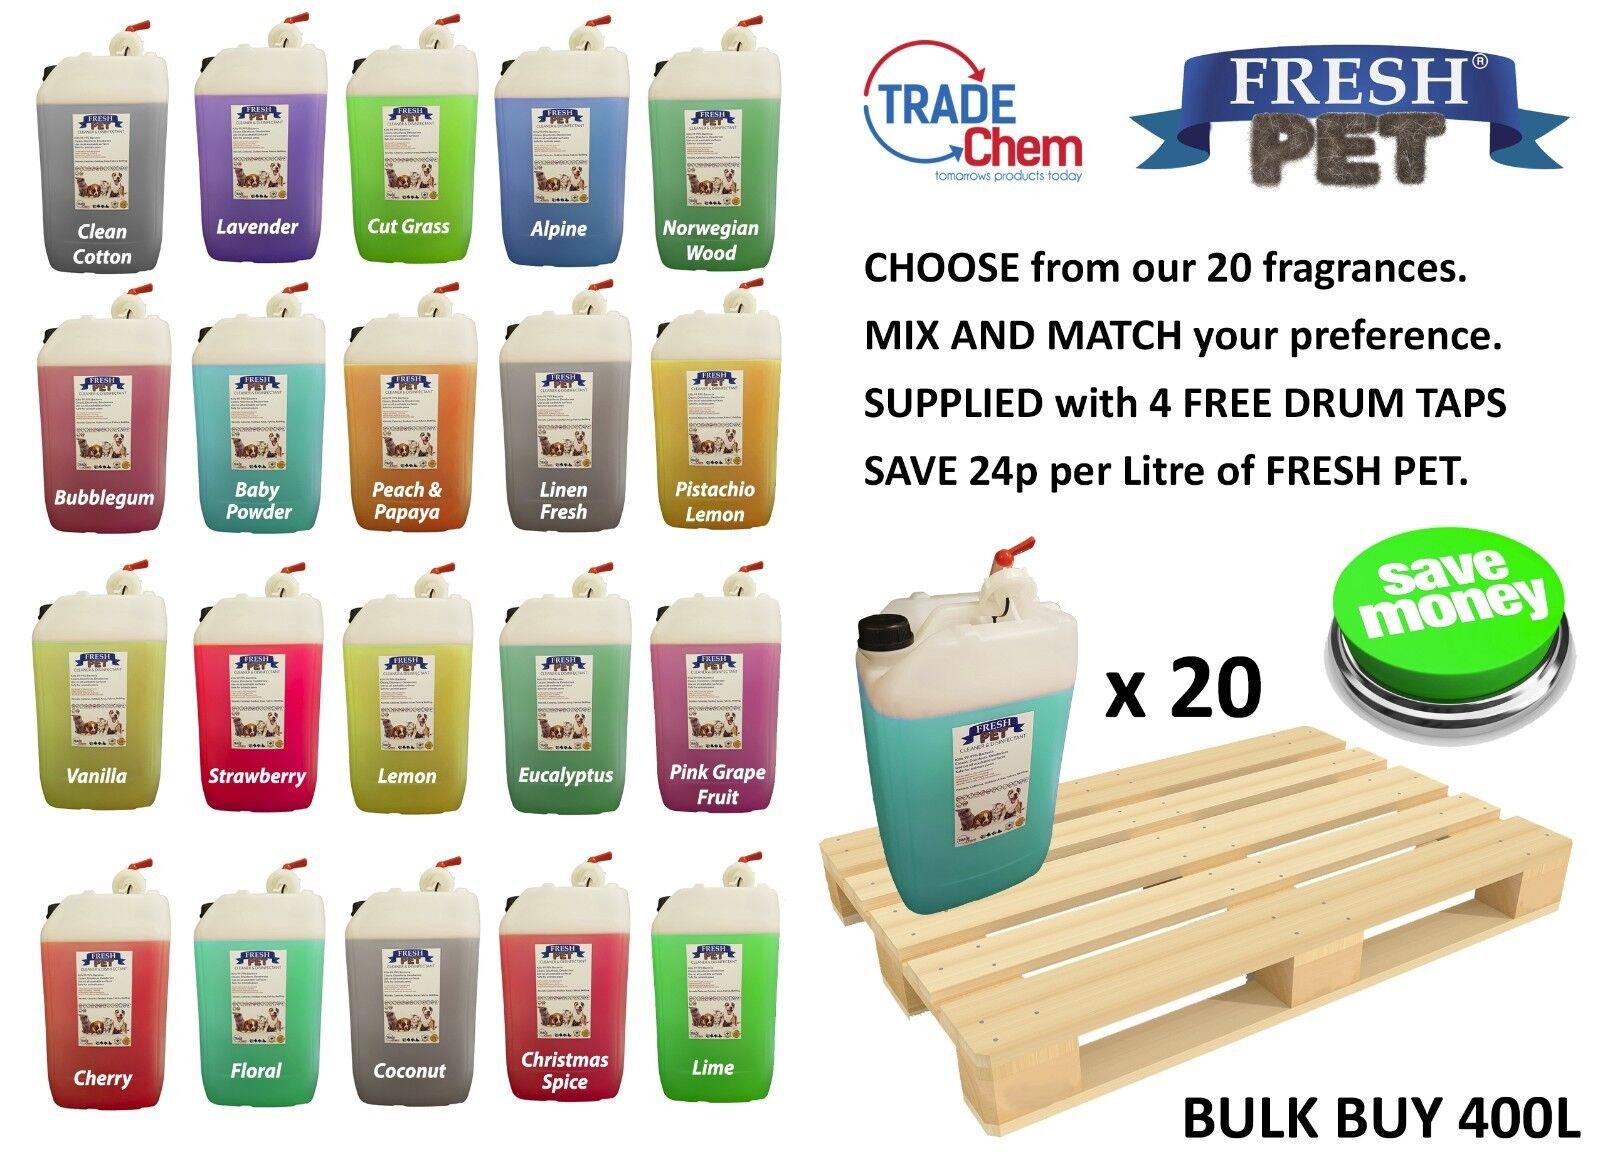 20 x 20L FRESH PET Kennel Disinfectant, Cleaner, Deodoriser - MIX & MATCH